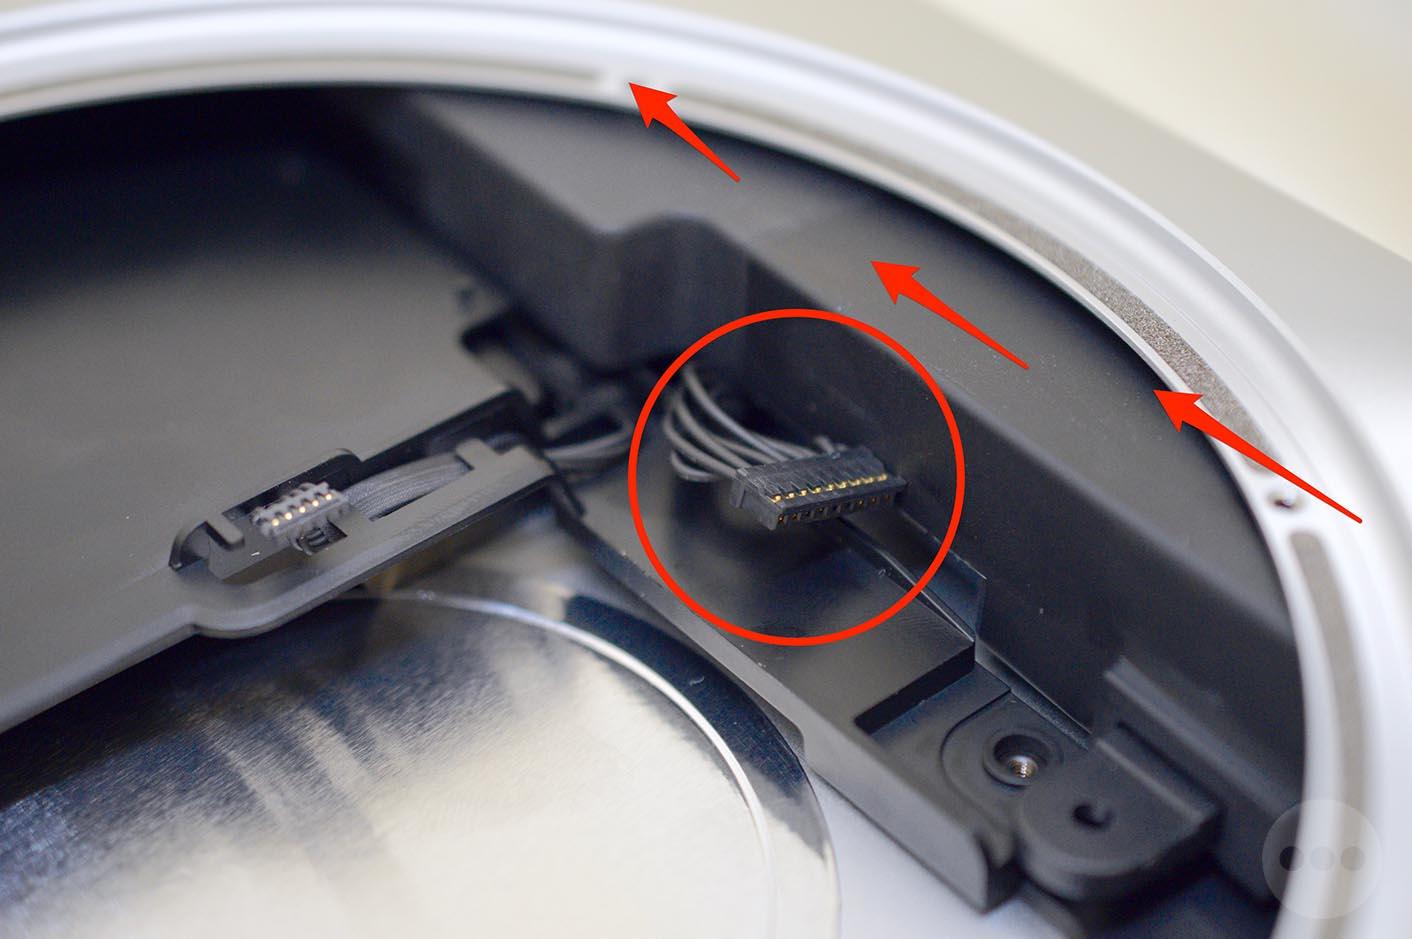 Tutoriel démontage Mac mini 2014